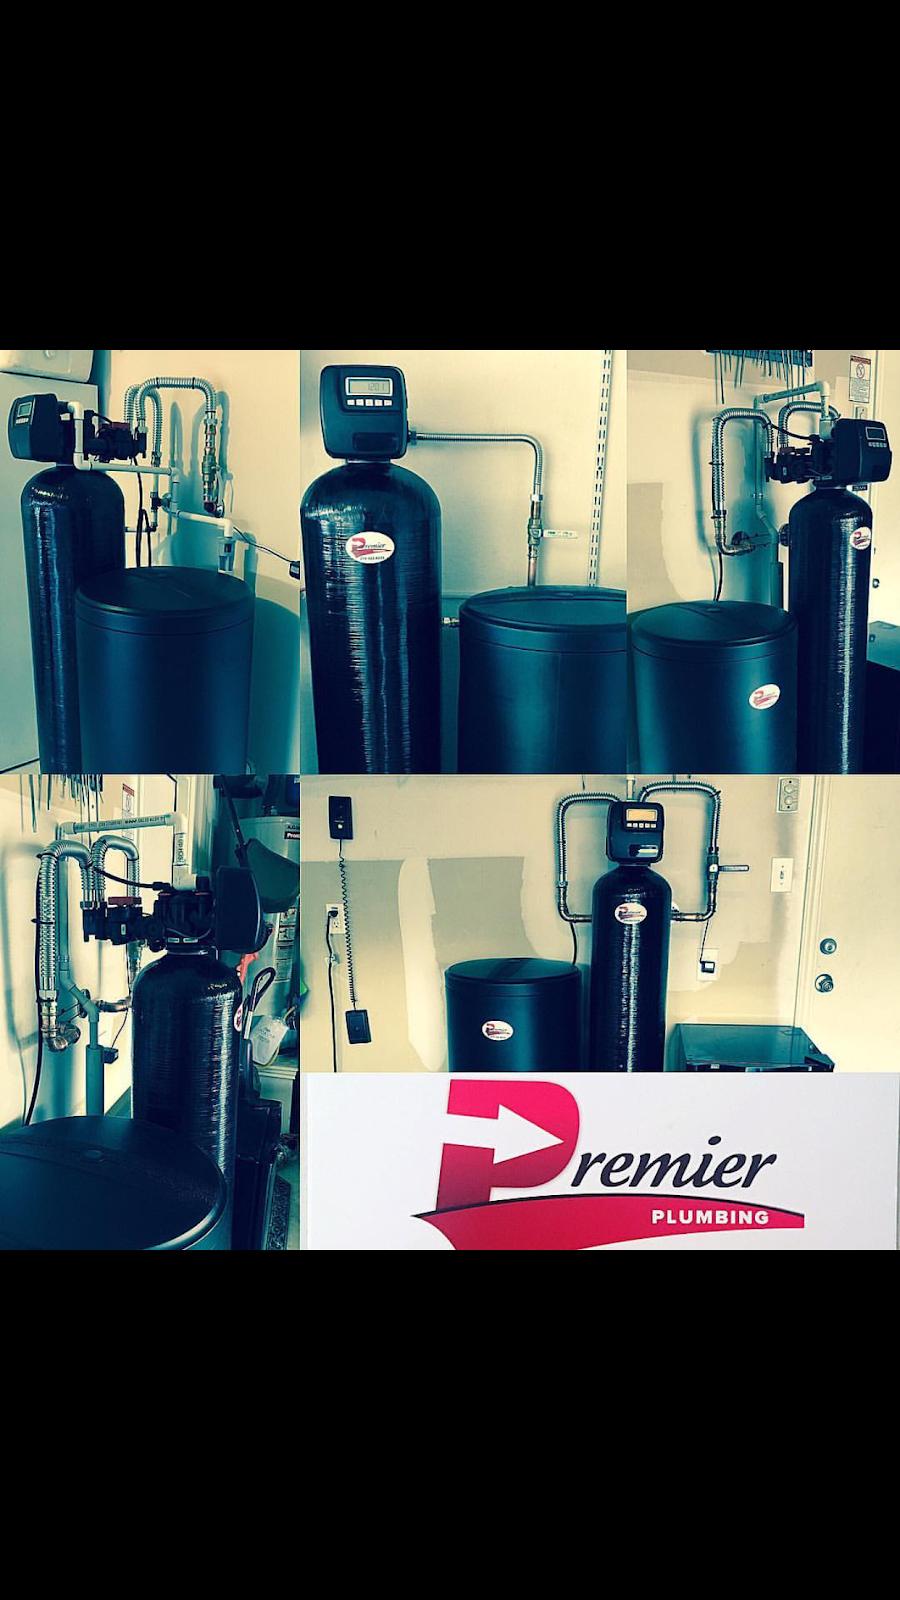 Premier Plumbing Services - plumber    Photo 7 of 10   Address: 122 Ryan Dr, San Antonio, TX 78223, USA   Phone: (210) 322-8232